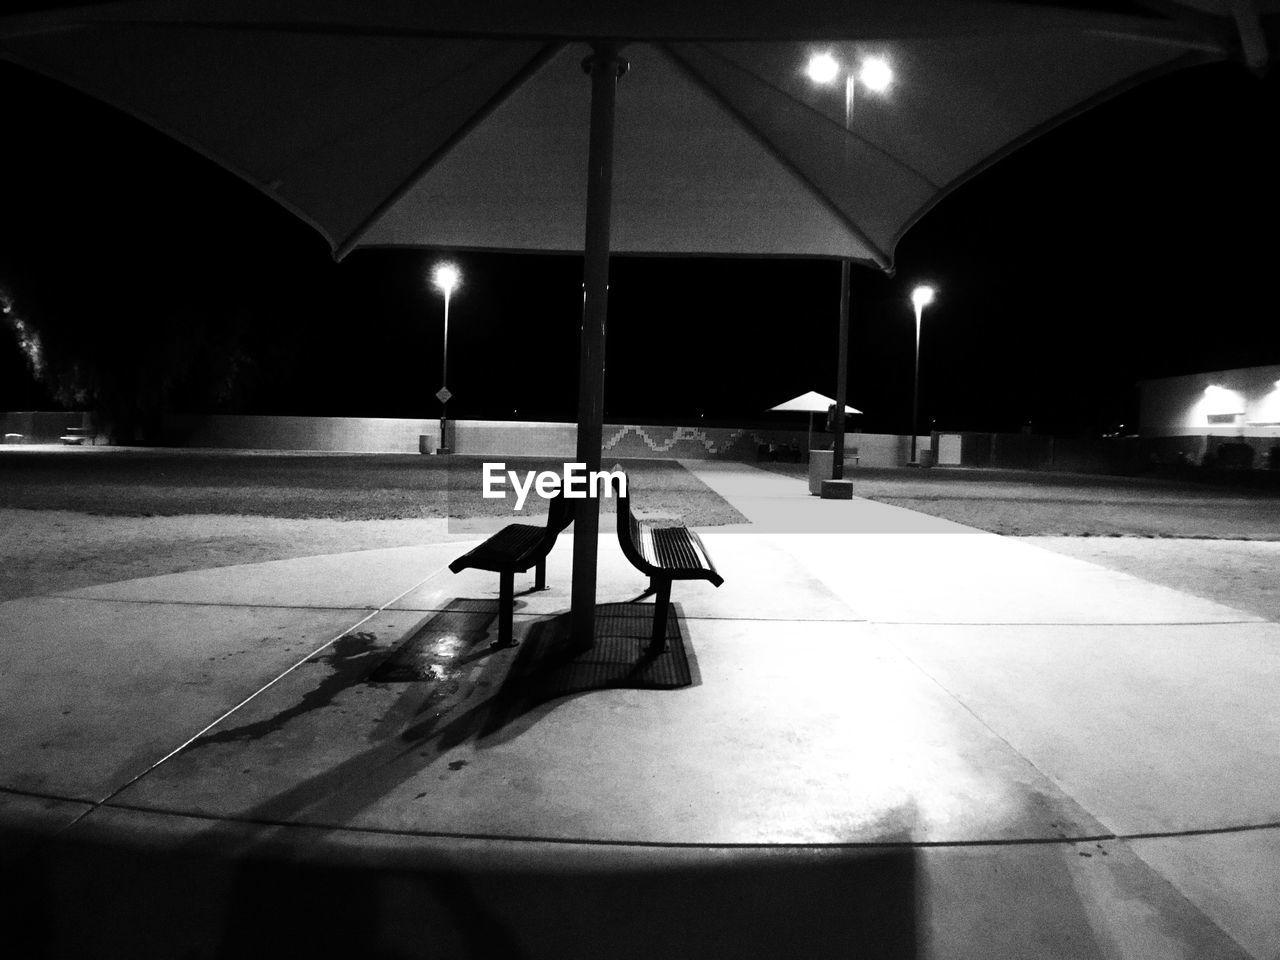 Illuminated empty benches in park at night